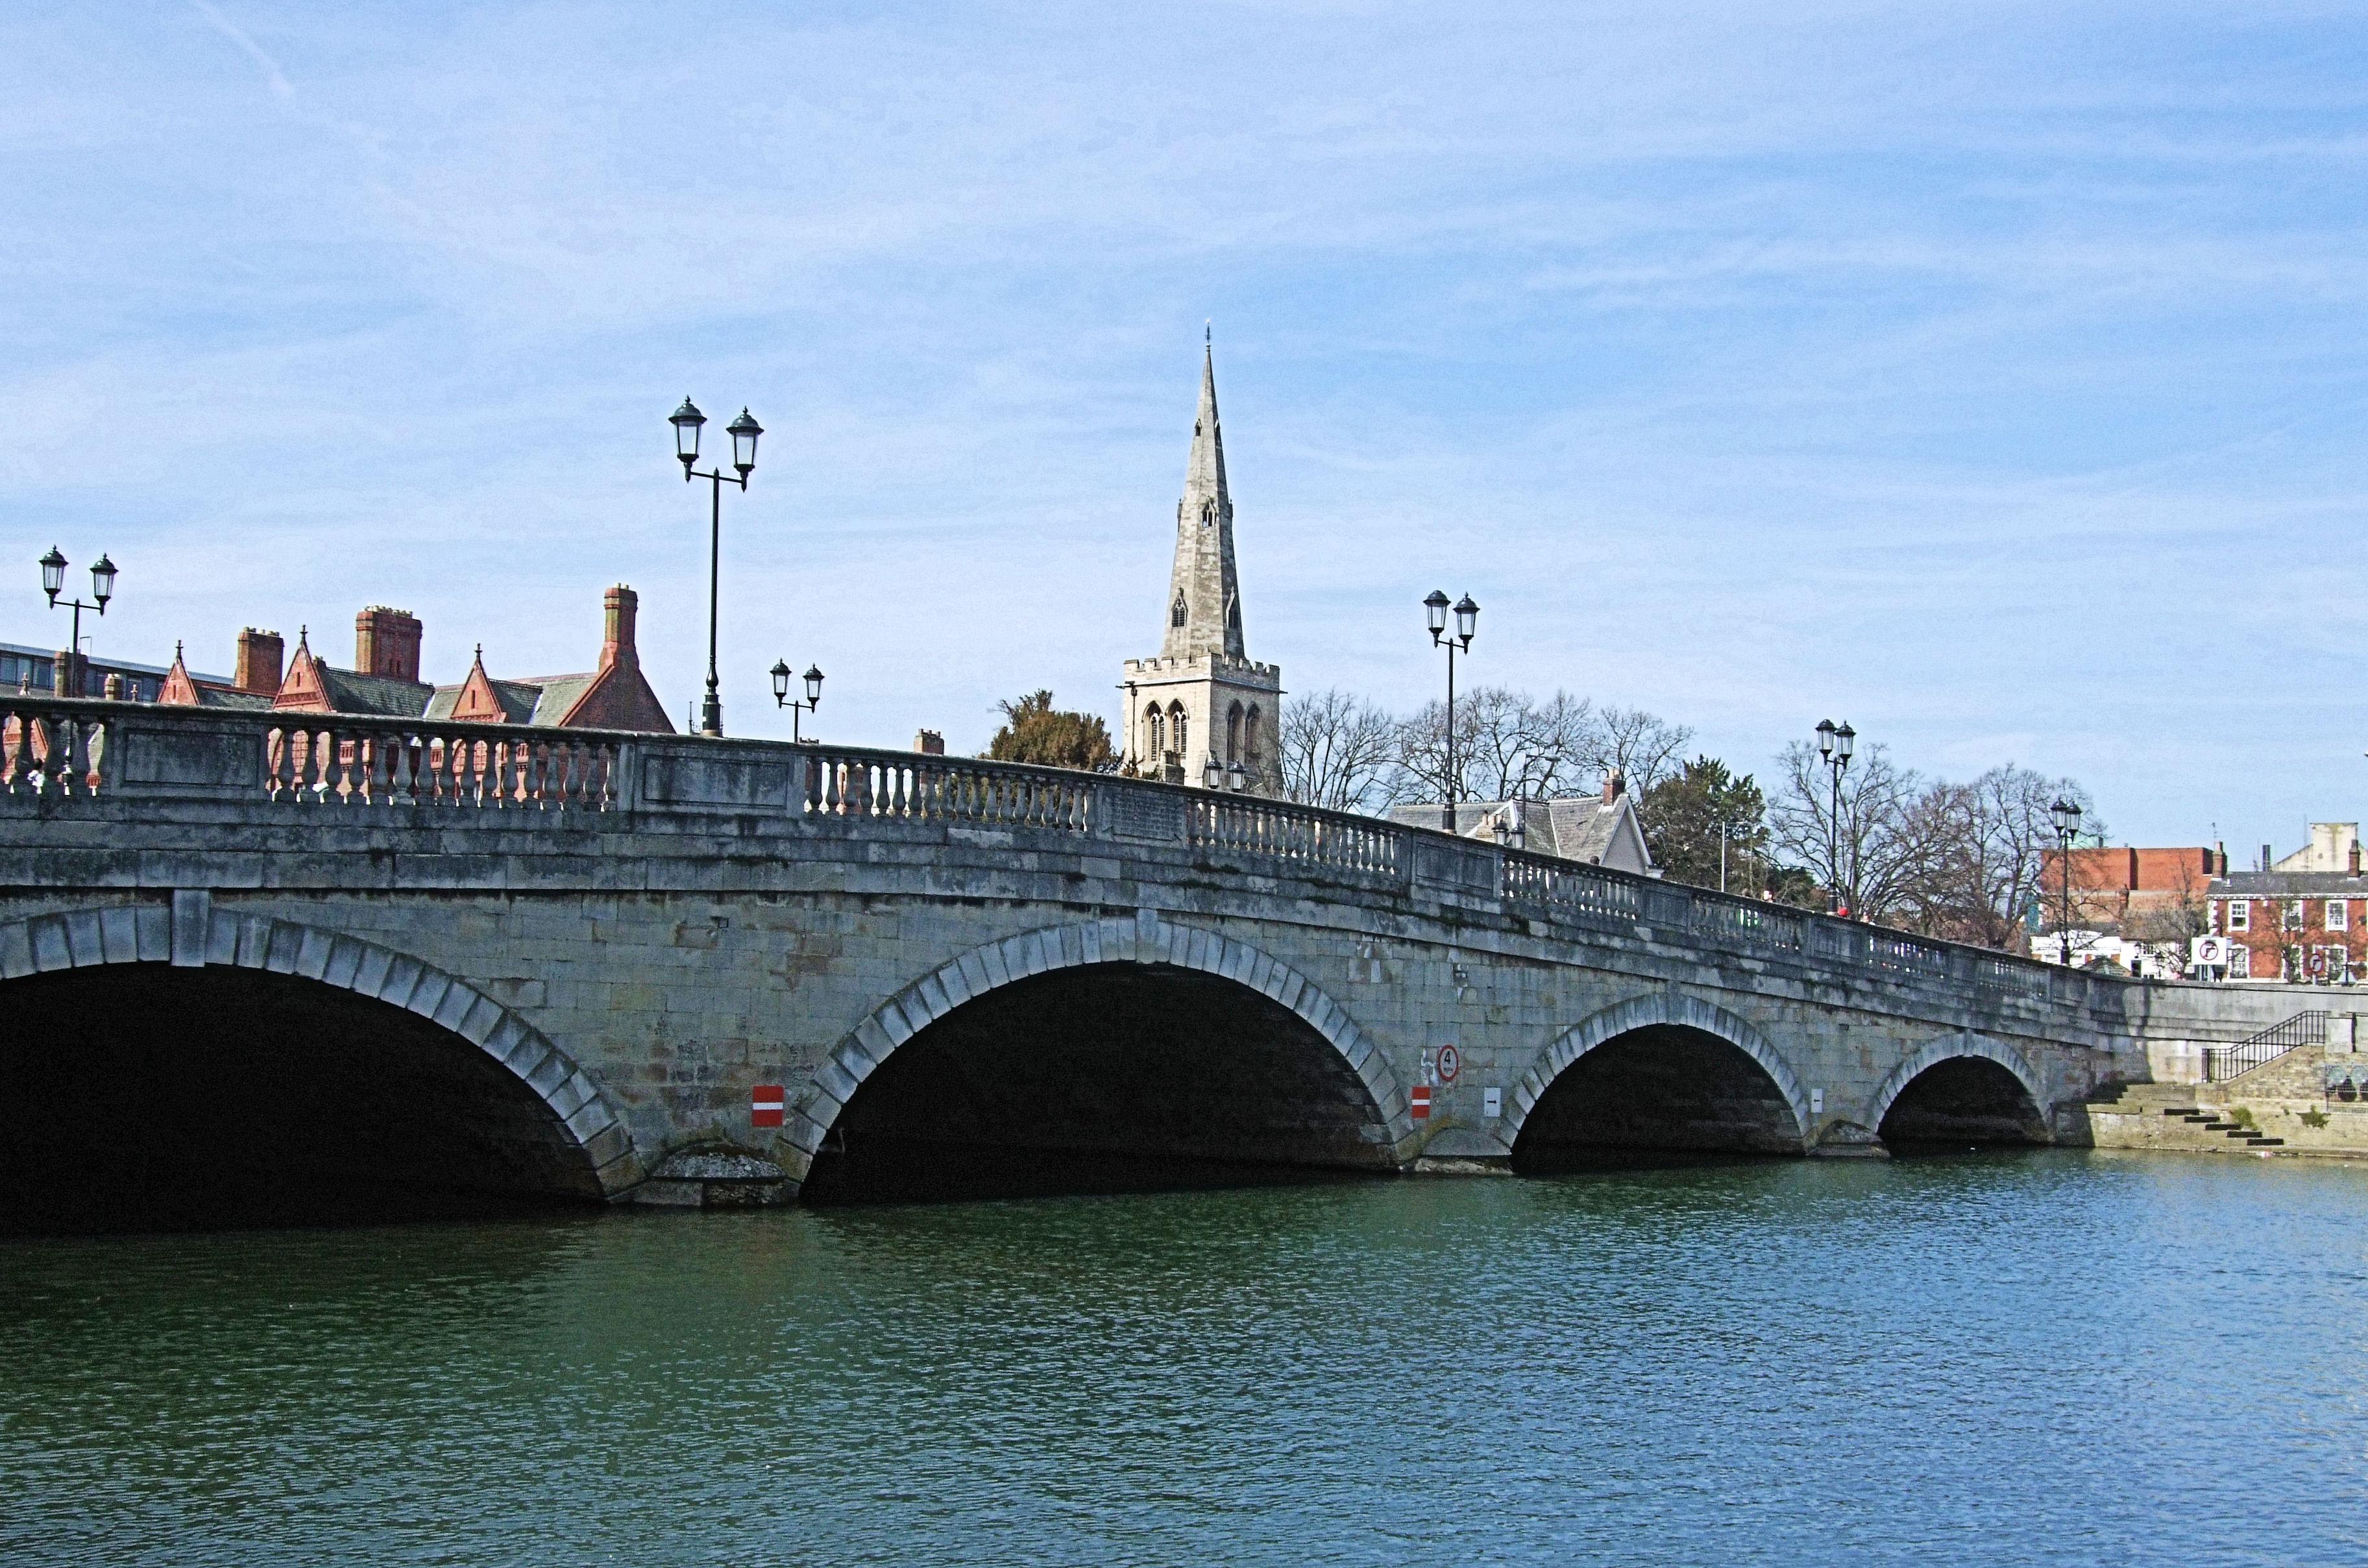 bridge on the river - photo #22